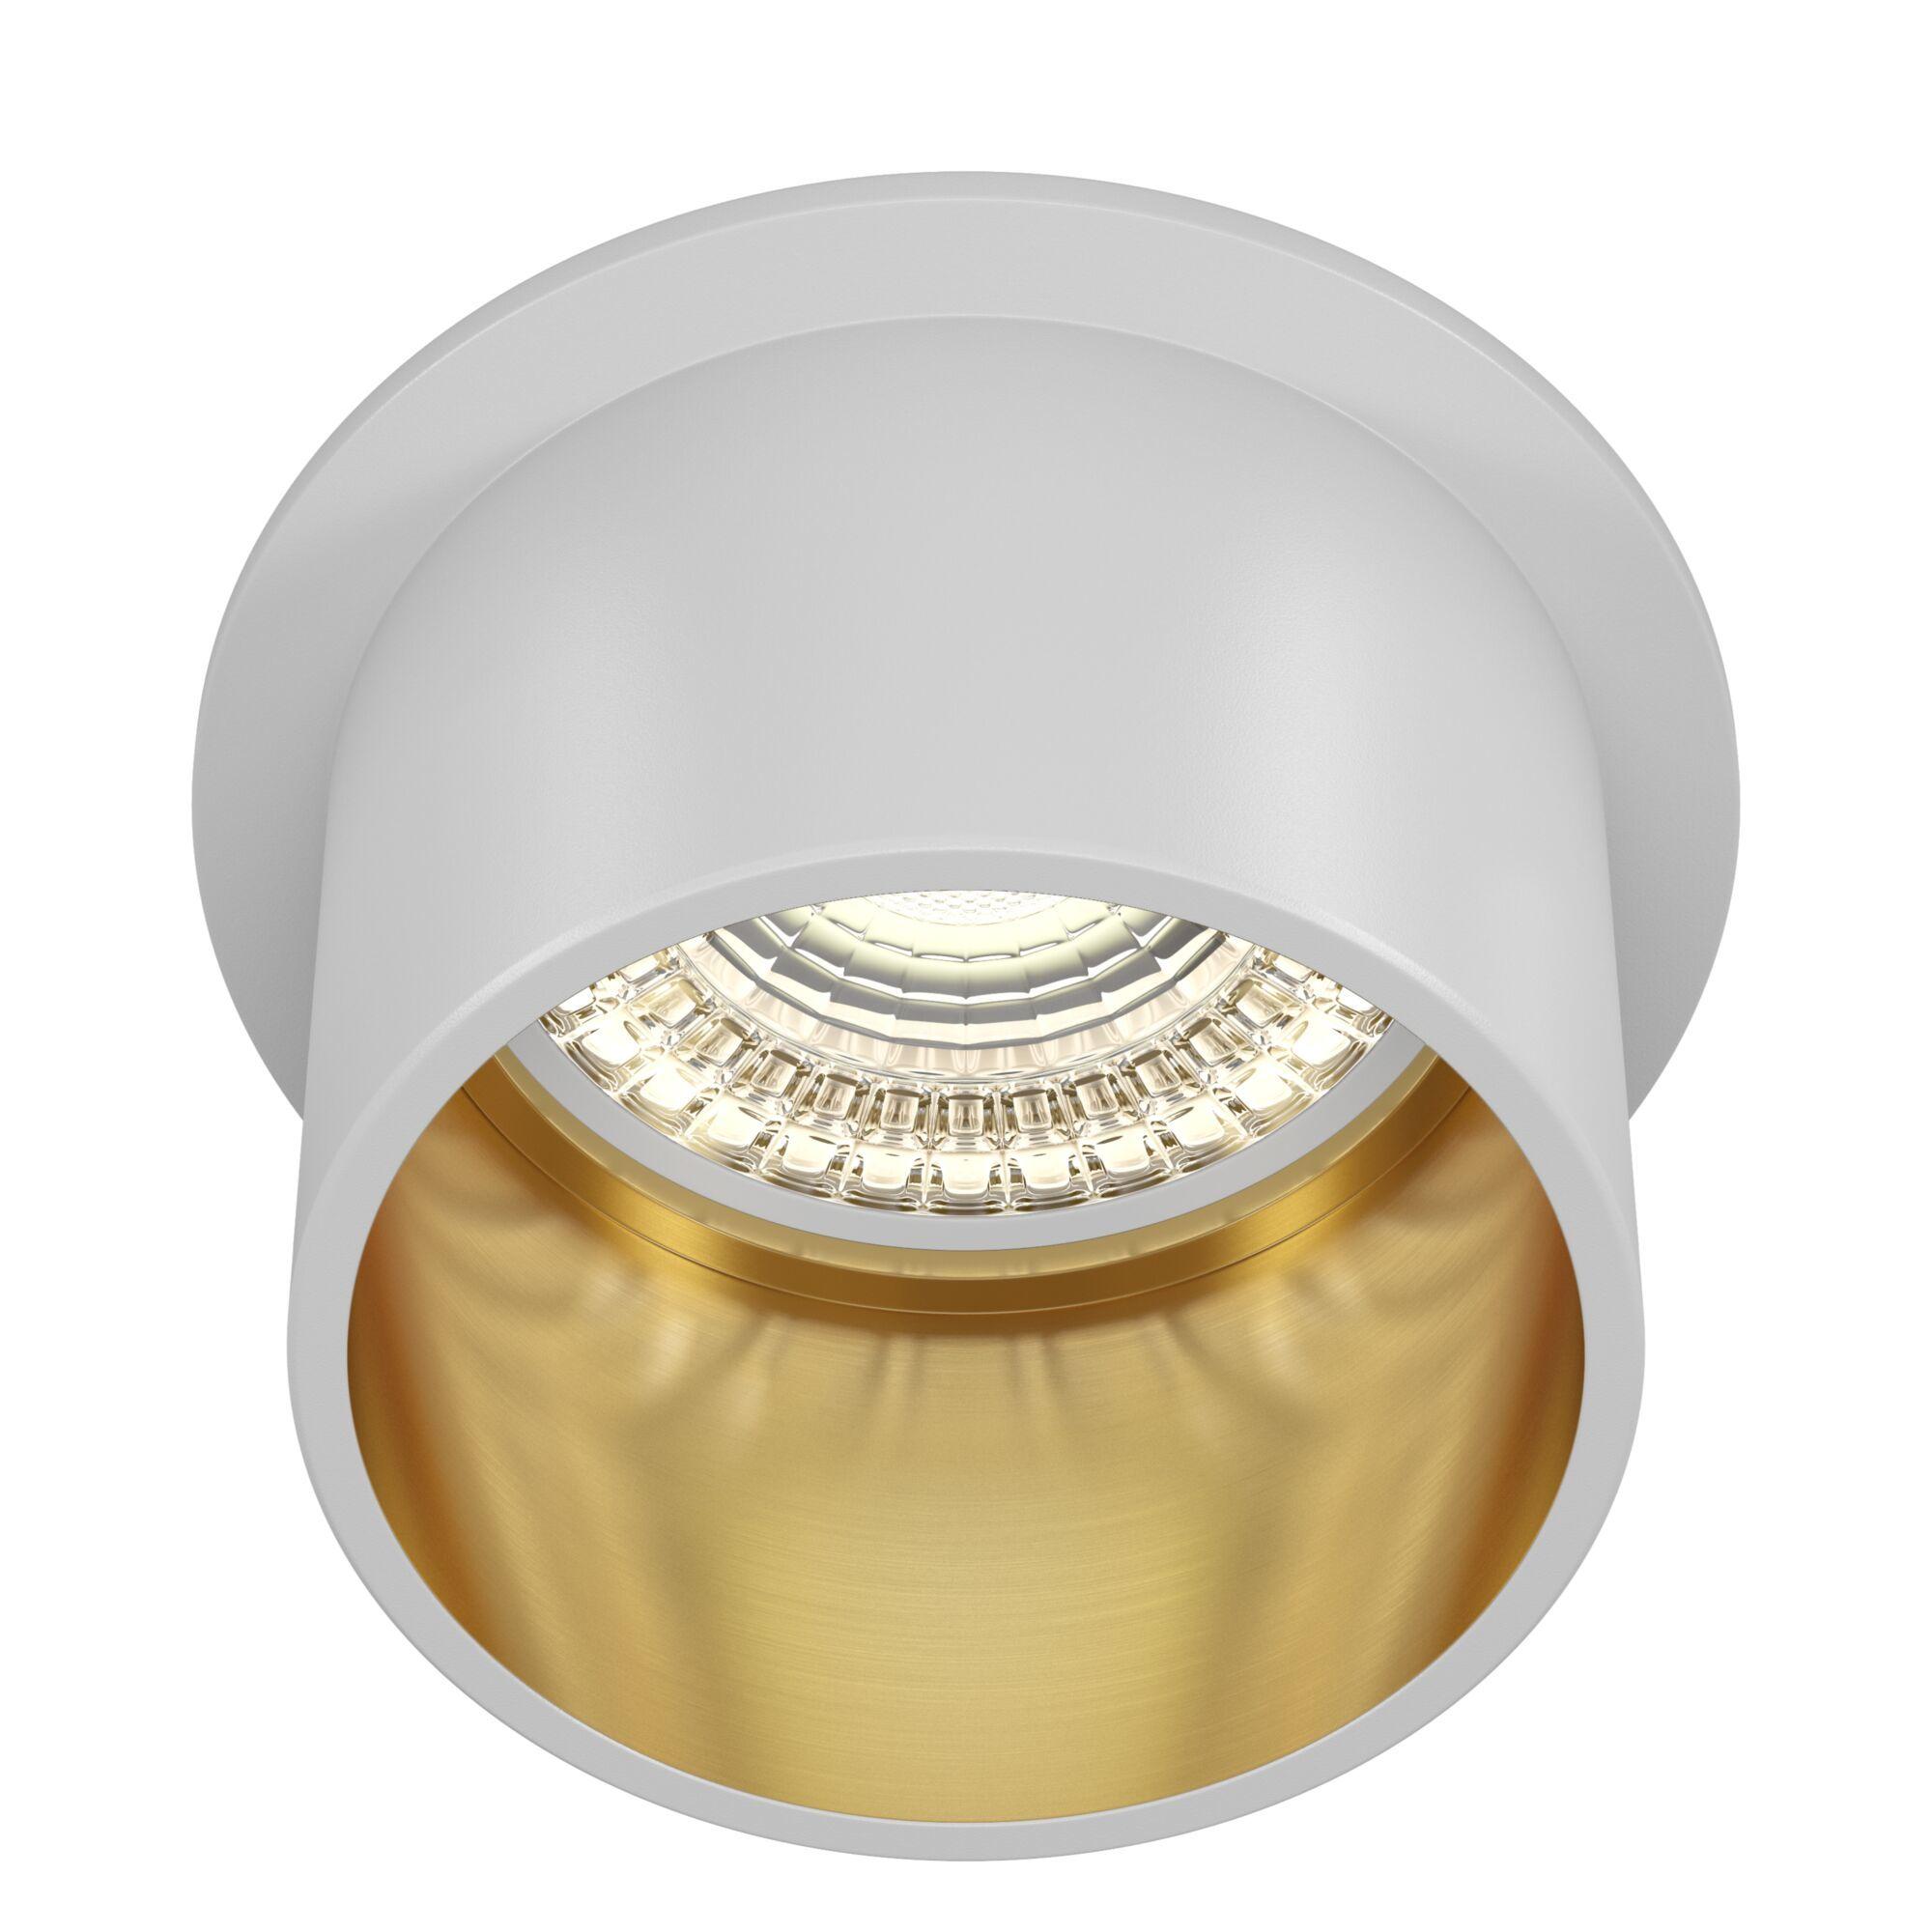 Светильник Maytoni Reif DL050-01WG, 1xGU10x50W, белый с золотом, золото с белым, металл - фото 1